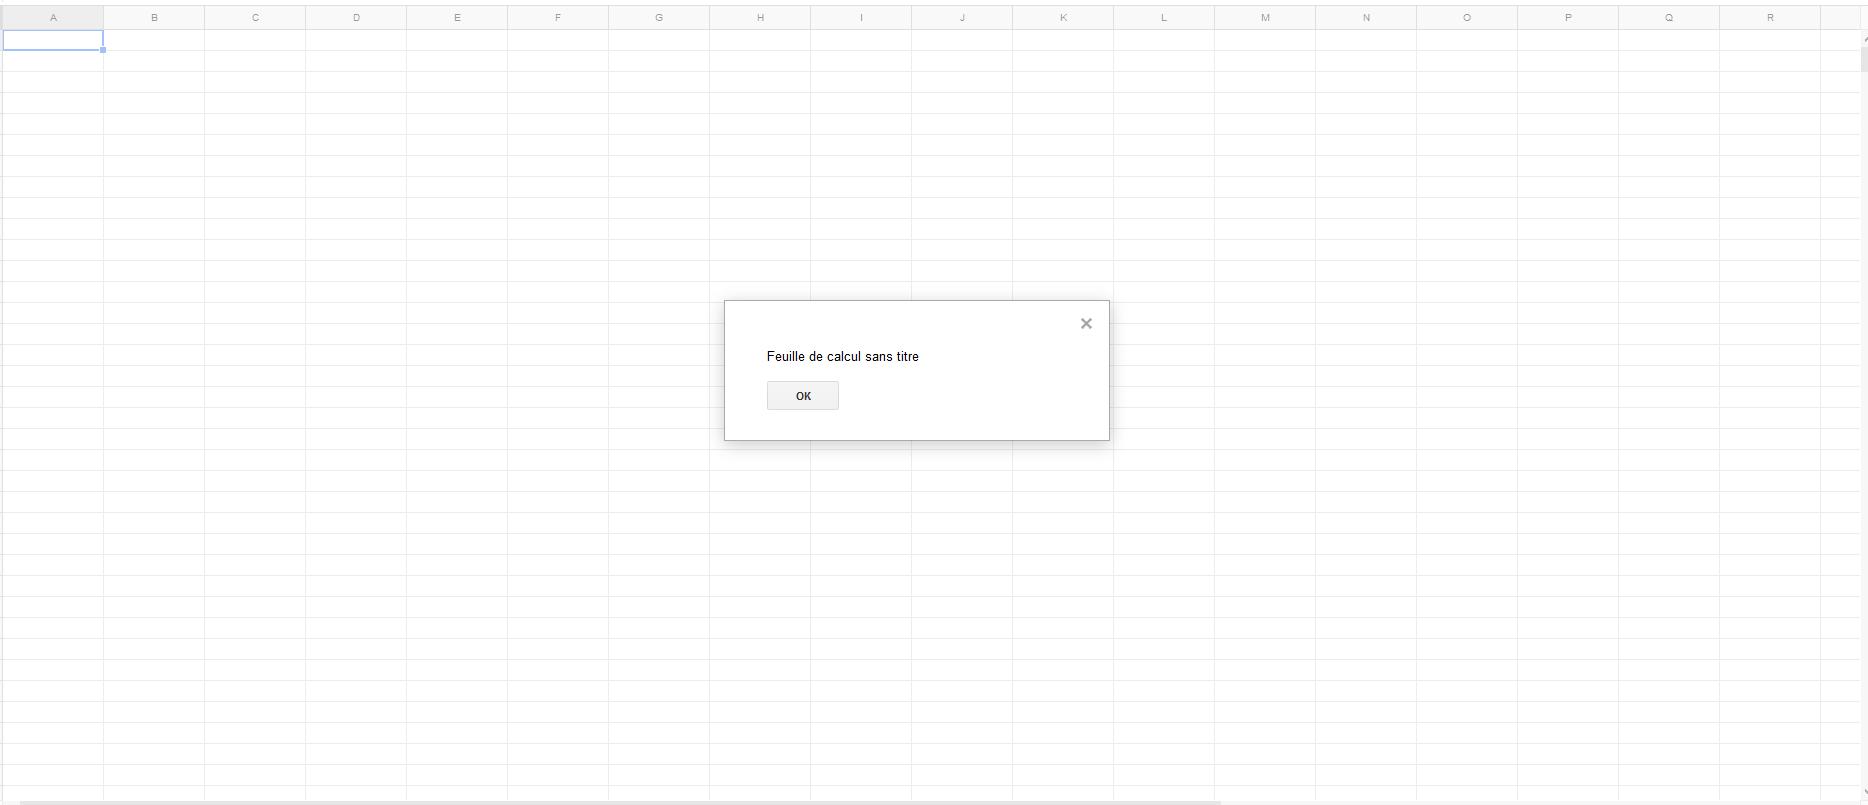 Les Macros Google Spreadsheet Tutoriels Zeste De Savoir